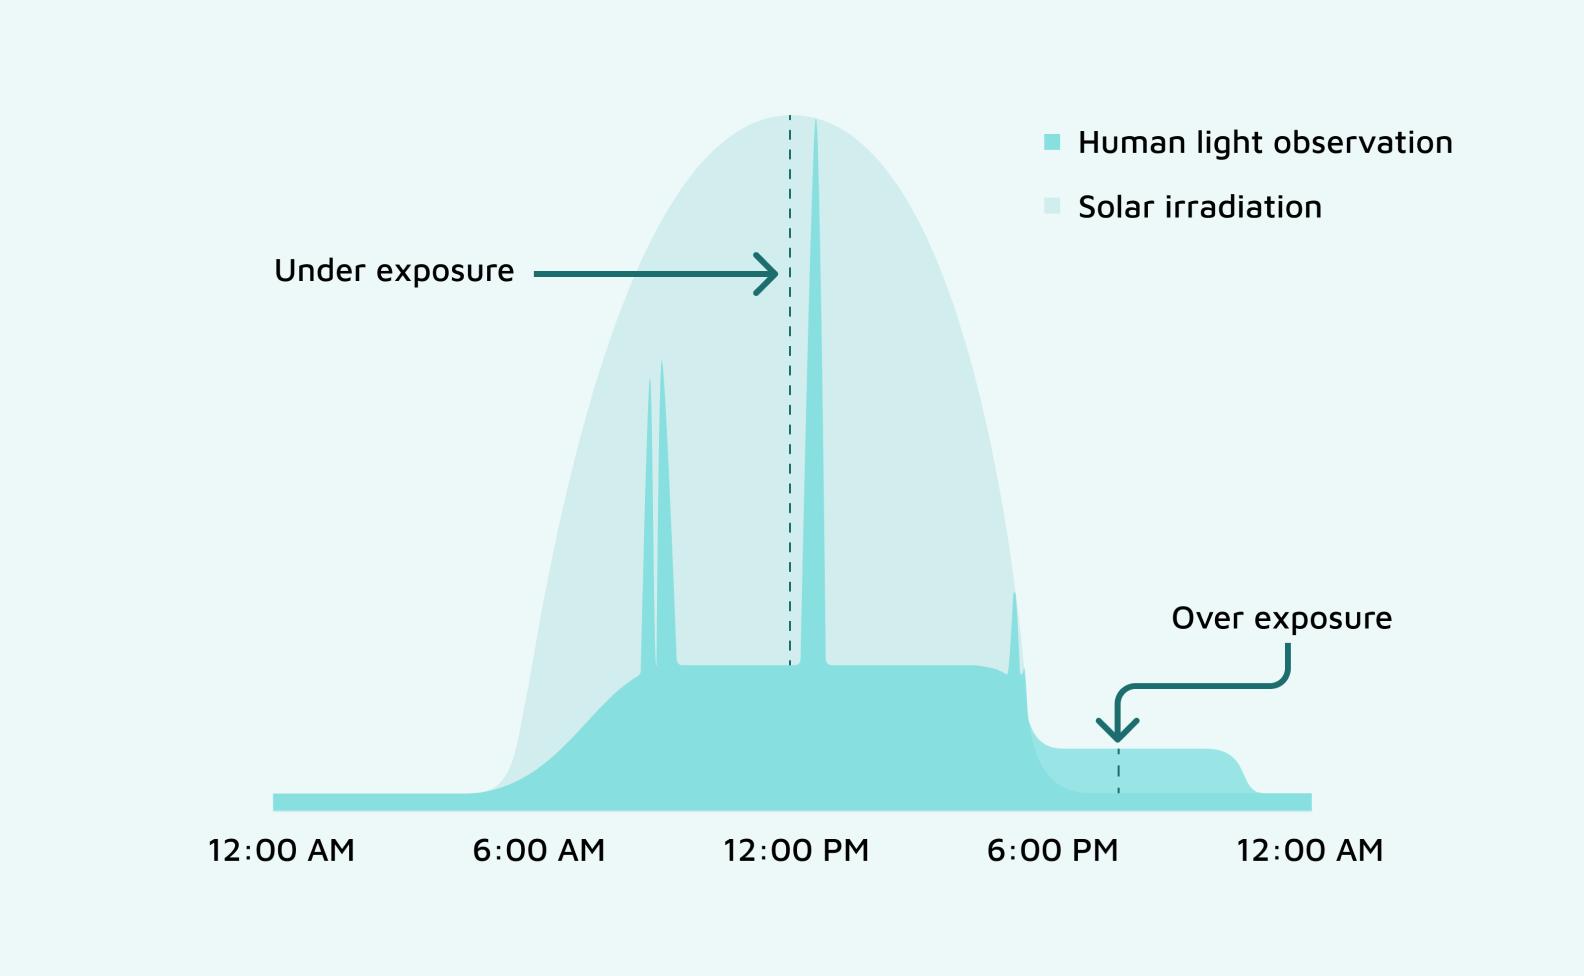 Graph showing human light exposure patterns